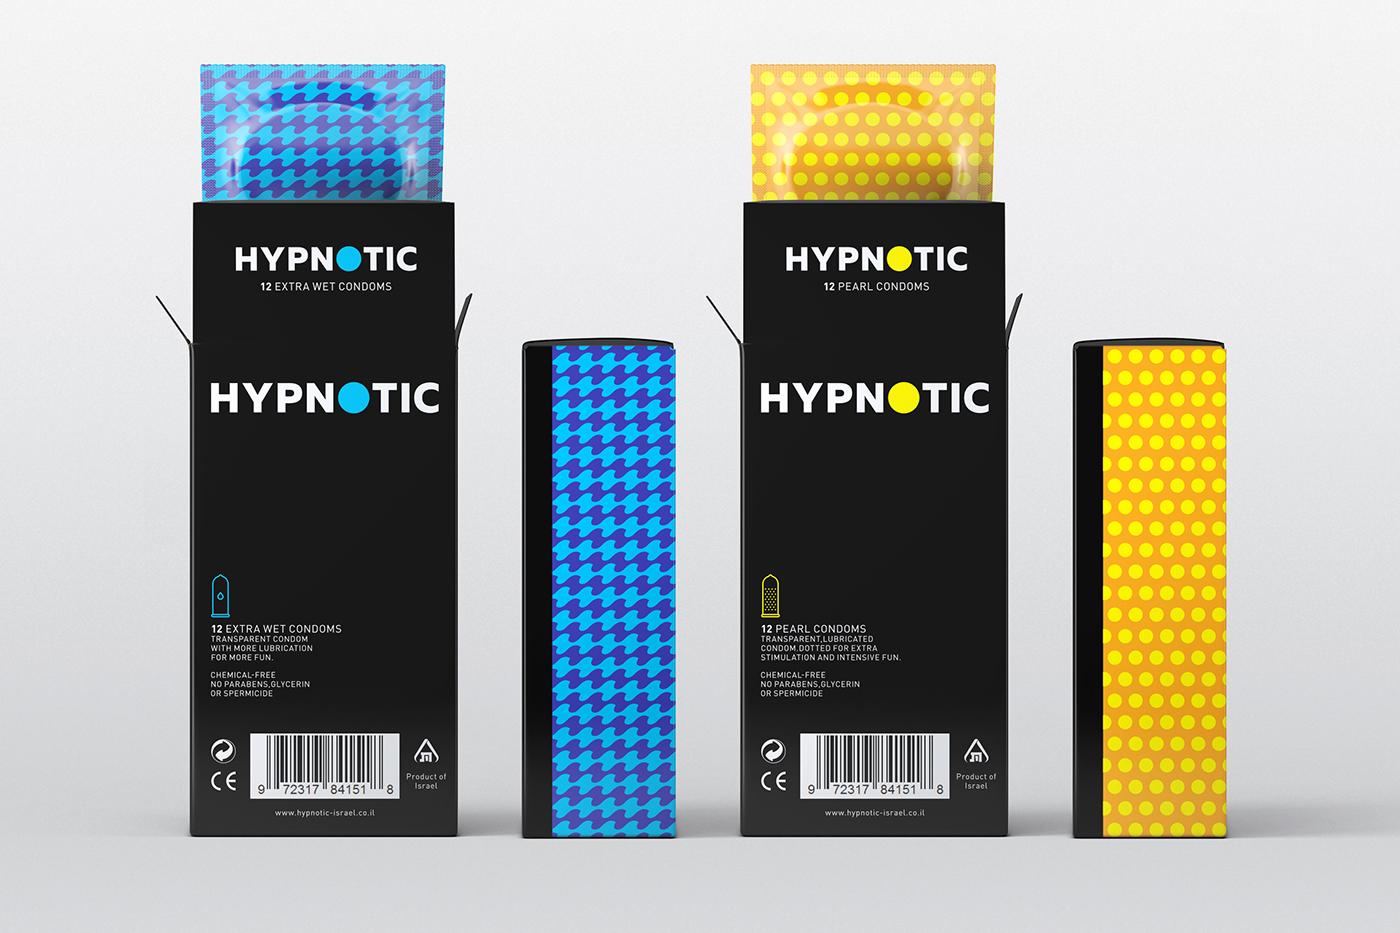 Hypnotic condoms on Behance